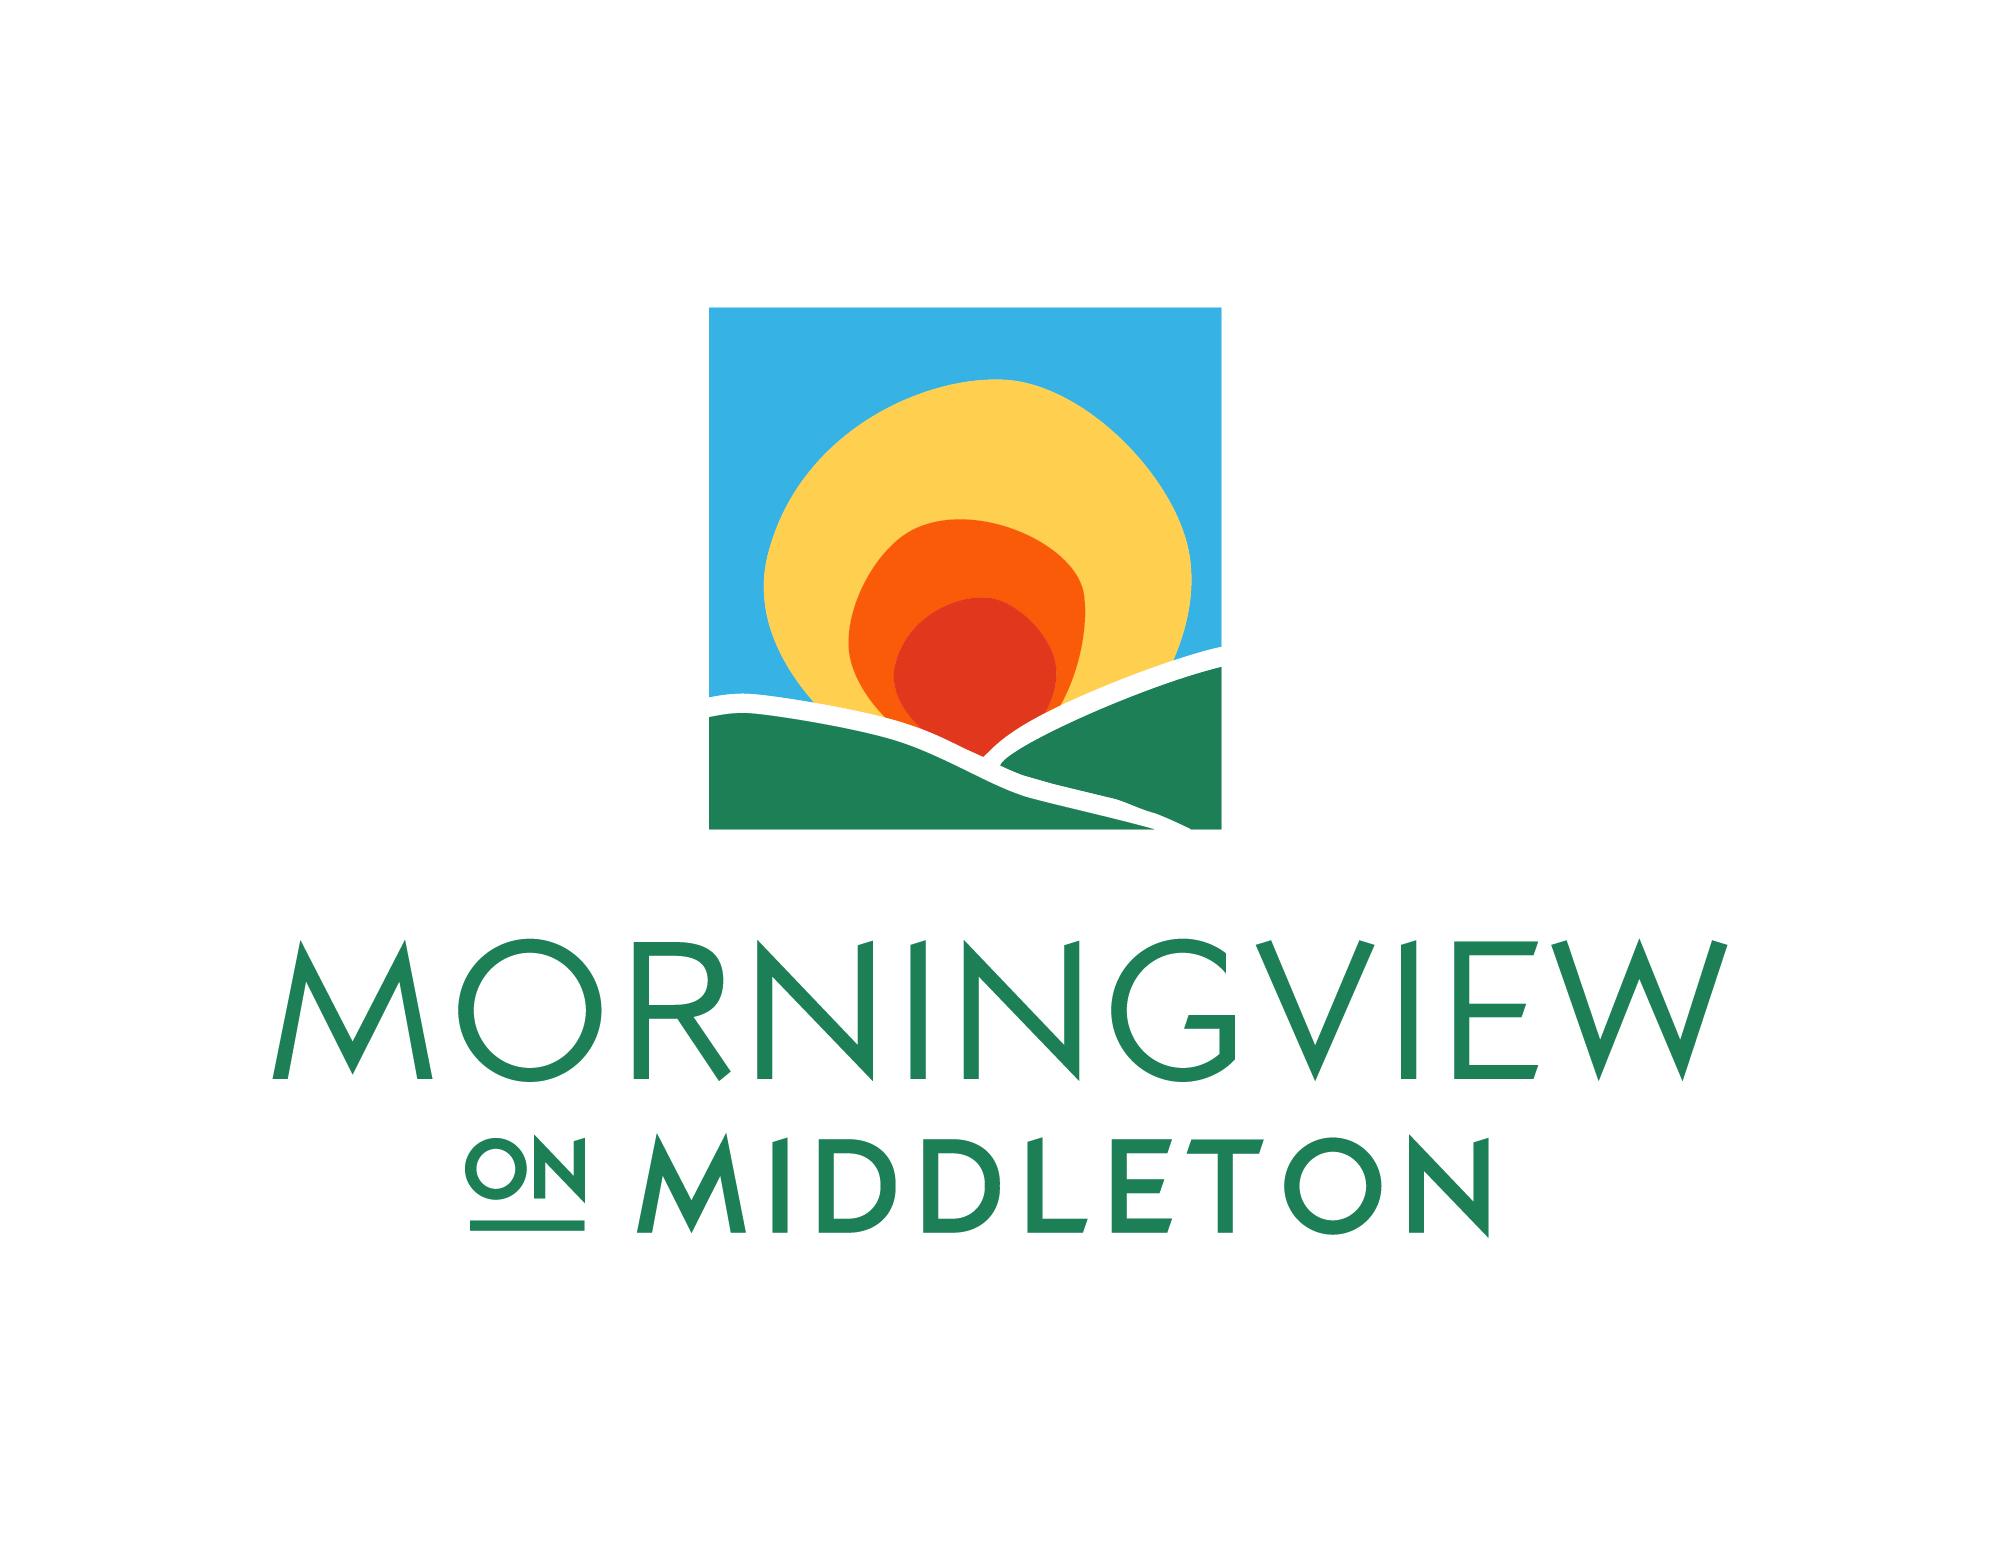 Morningview on Middleton logo